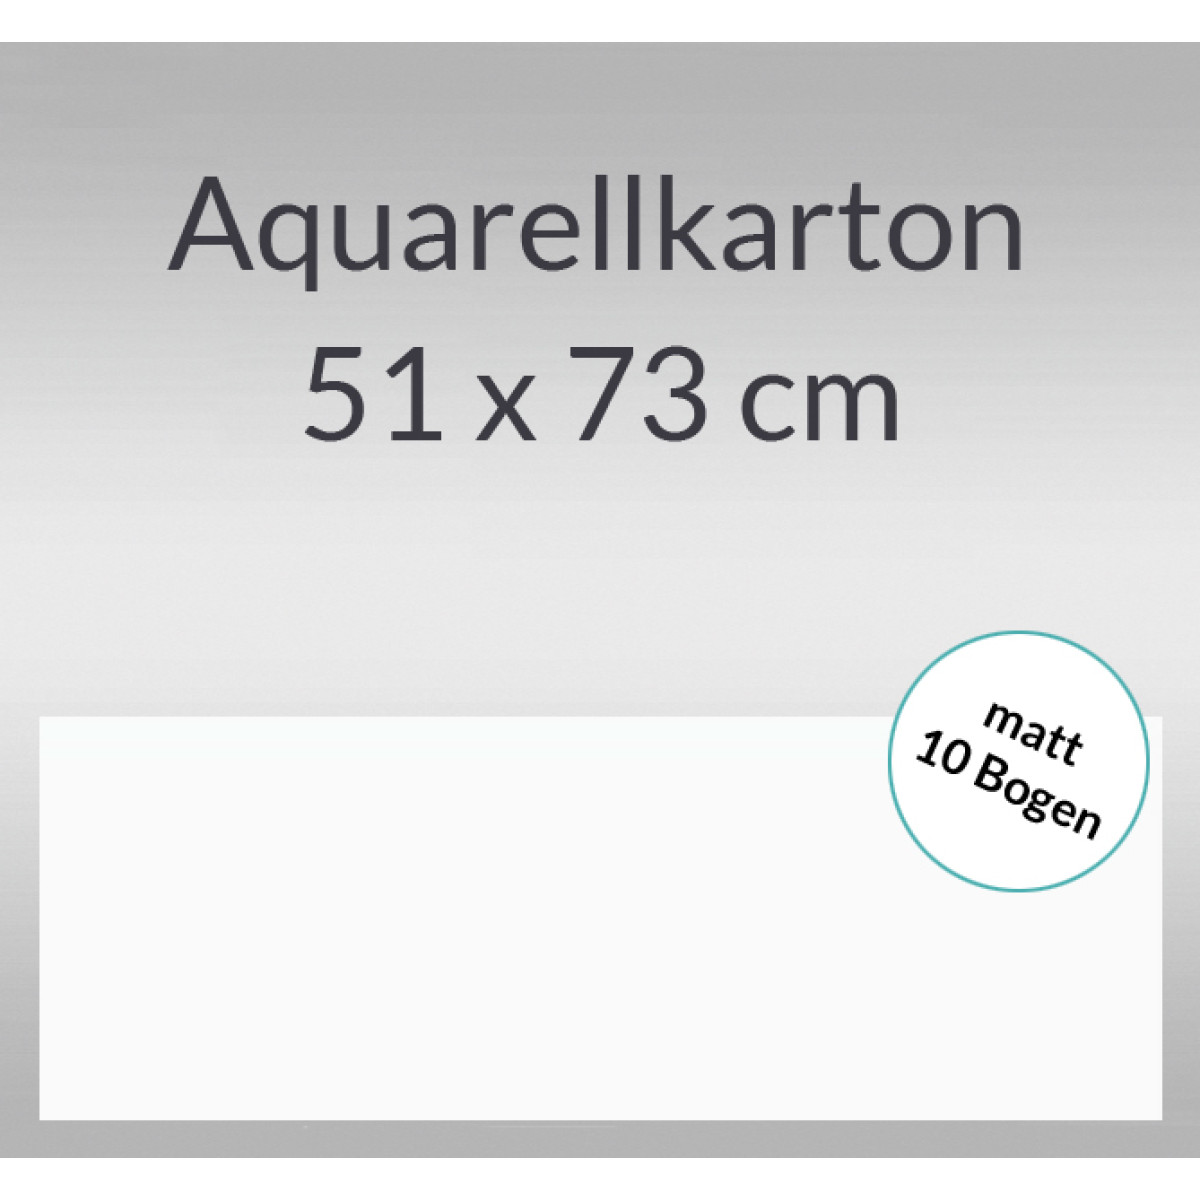 Aquarellkarton matt 200 g/qm 51 x 73 cm